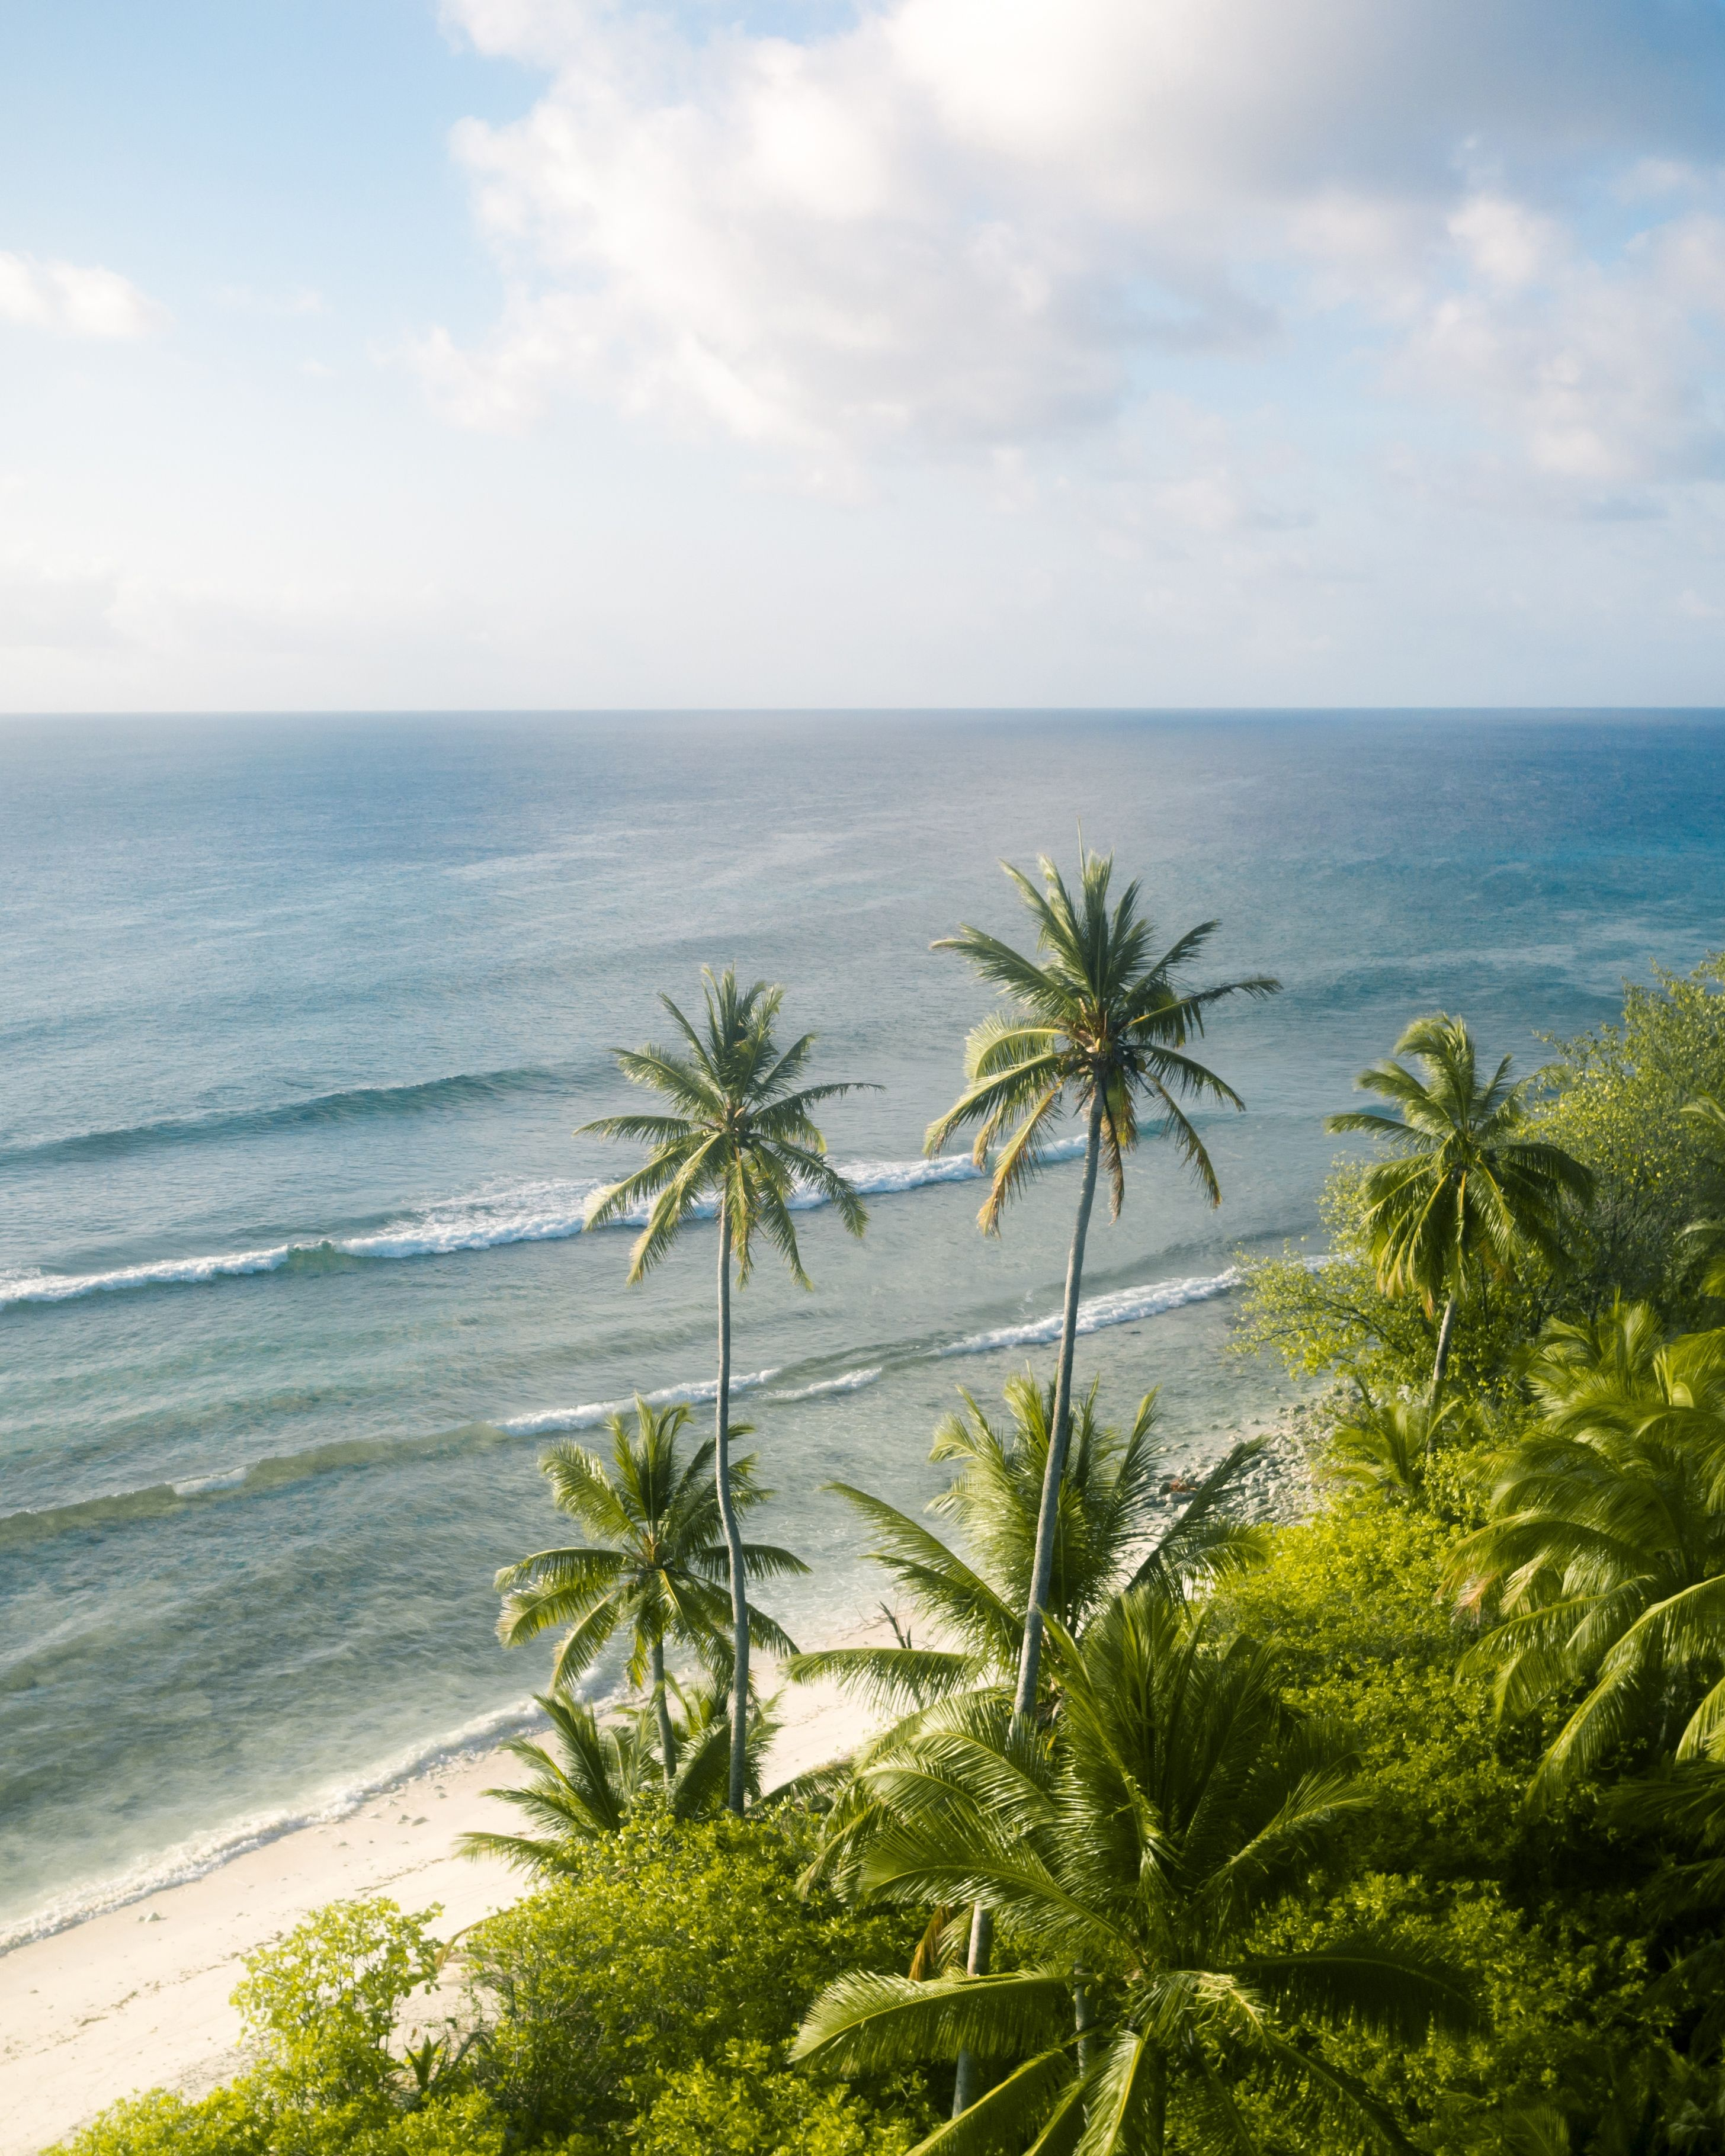 Where The Jungle Meets The Sea Cocos Islands Australia Hd Wallpaper In 2020 Cocos Keeling Islands Cocos Island Australia Wallpaper